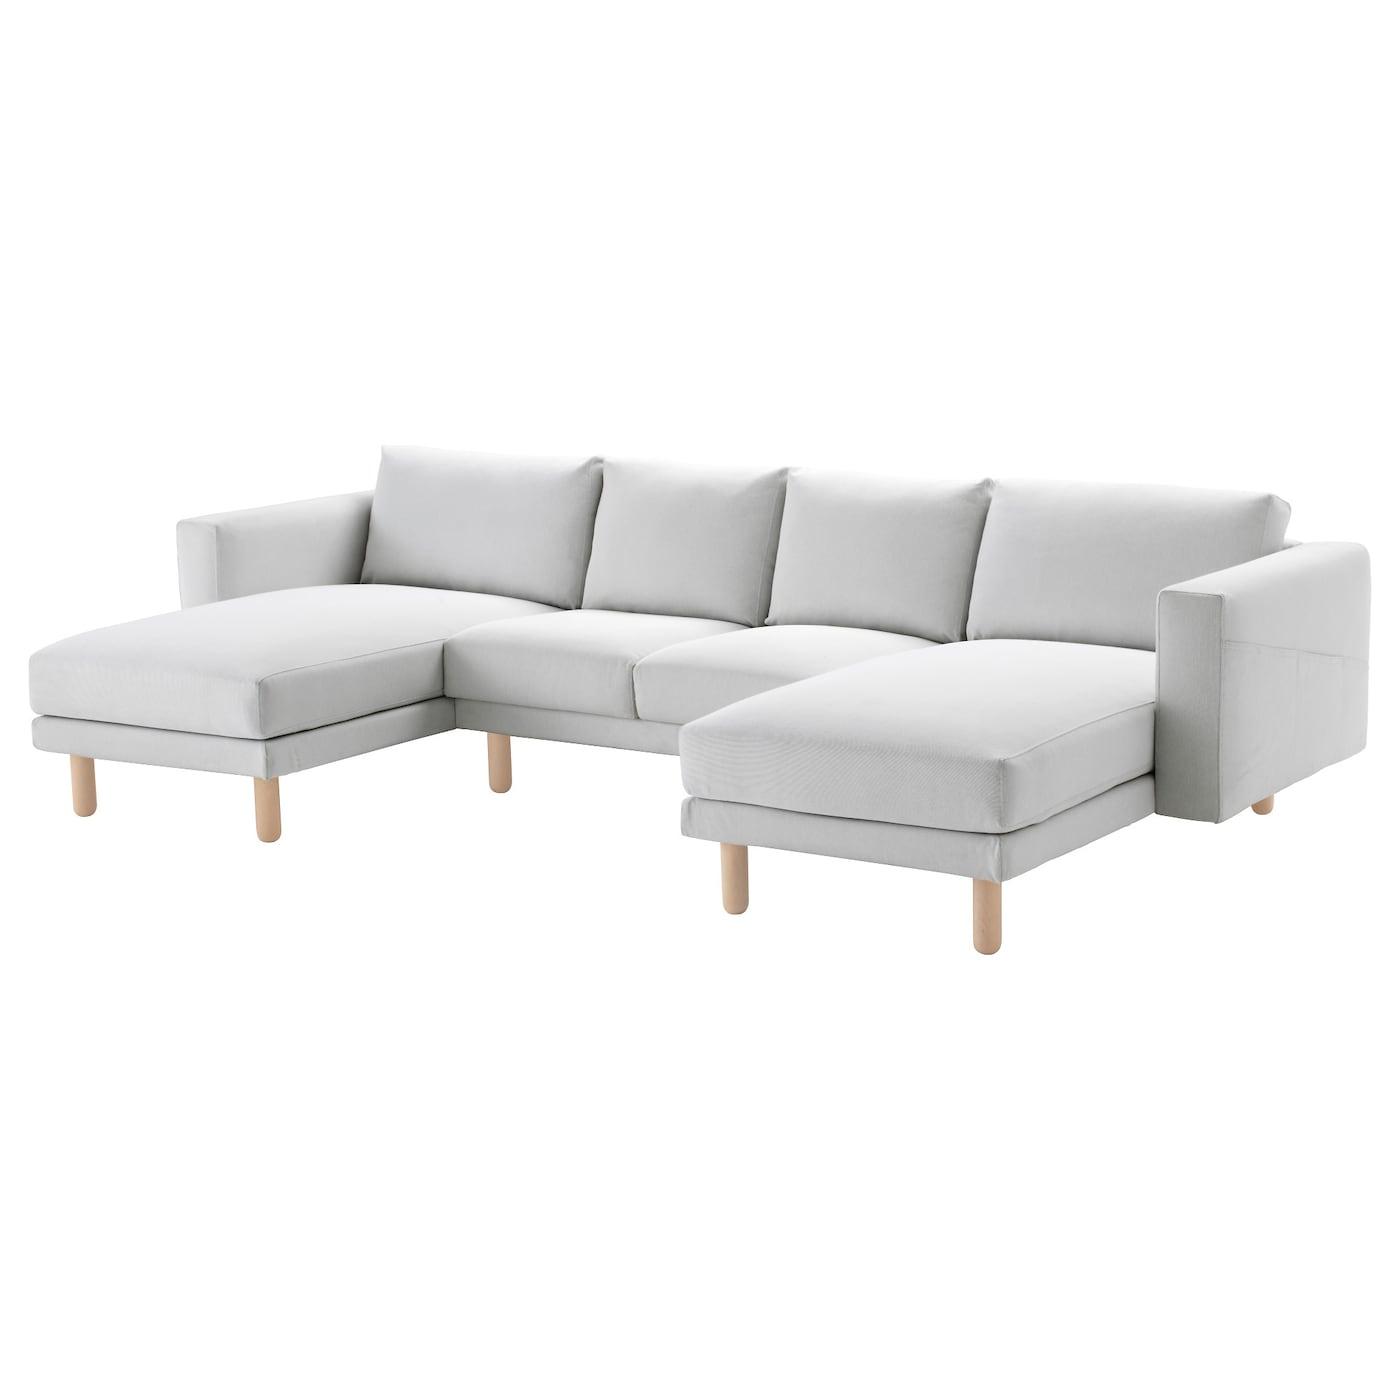 norsborg housse canap 4 places avec m ridiennes finnsta blanc ikea. Black Bedroom Furniture Sets. Home Design Ideas